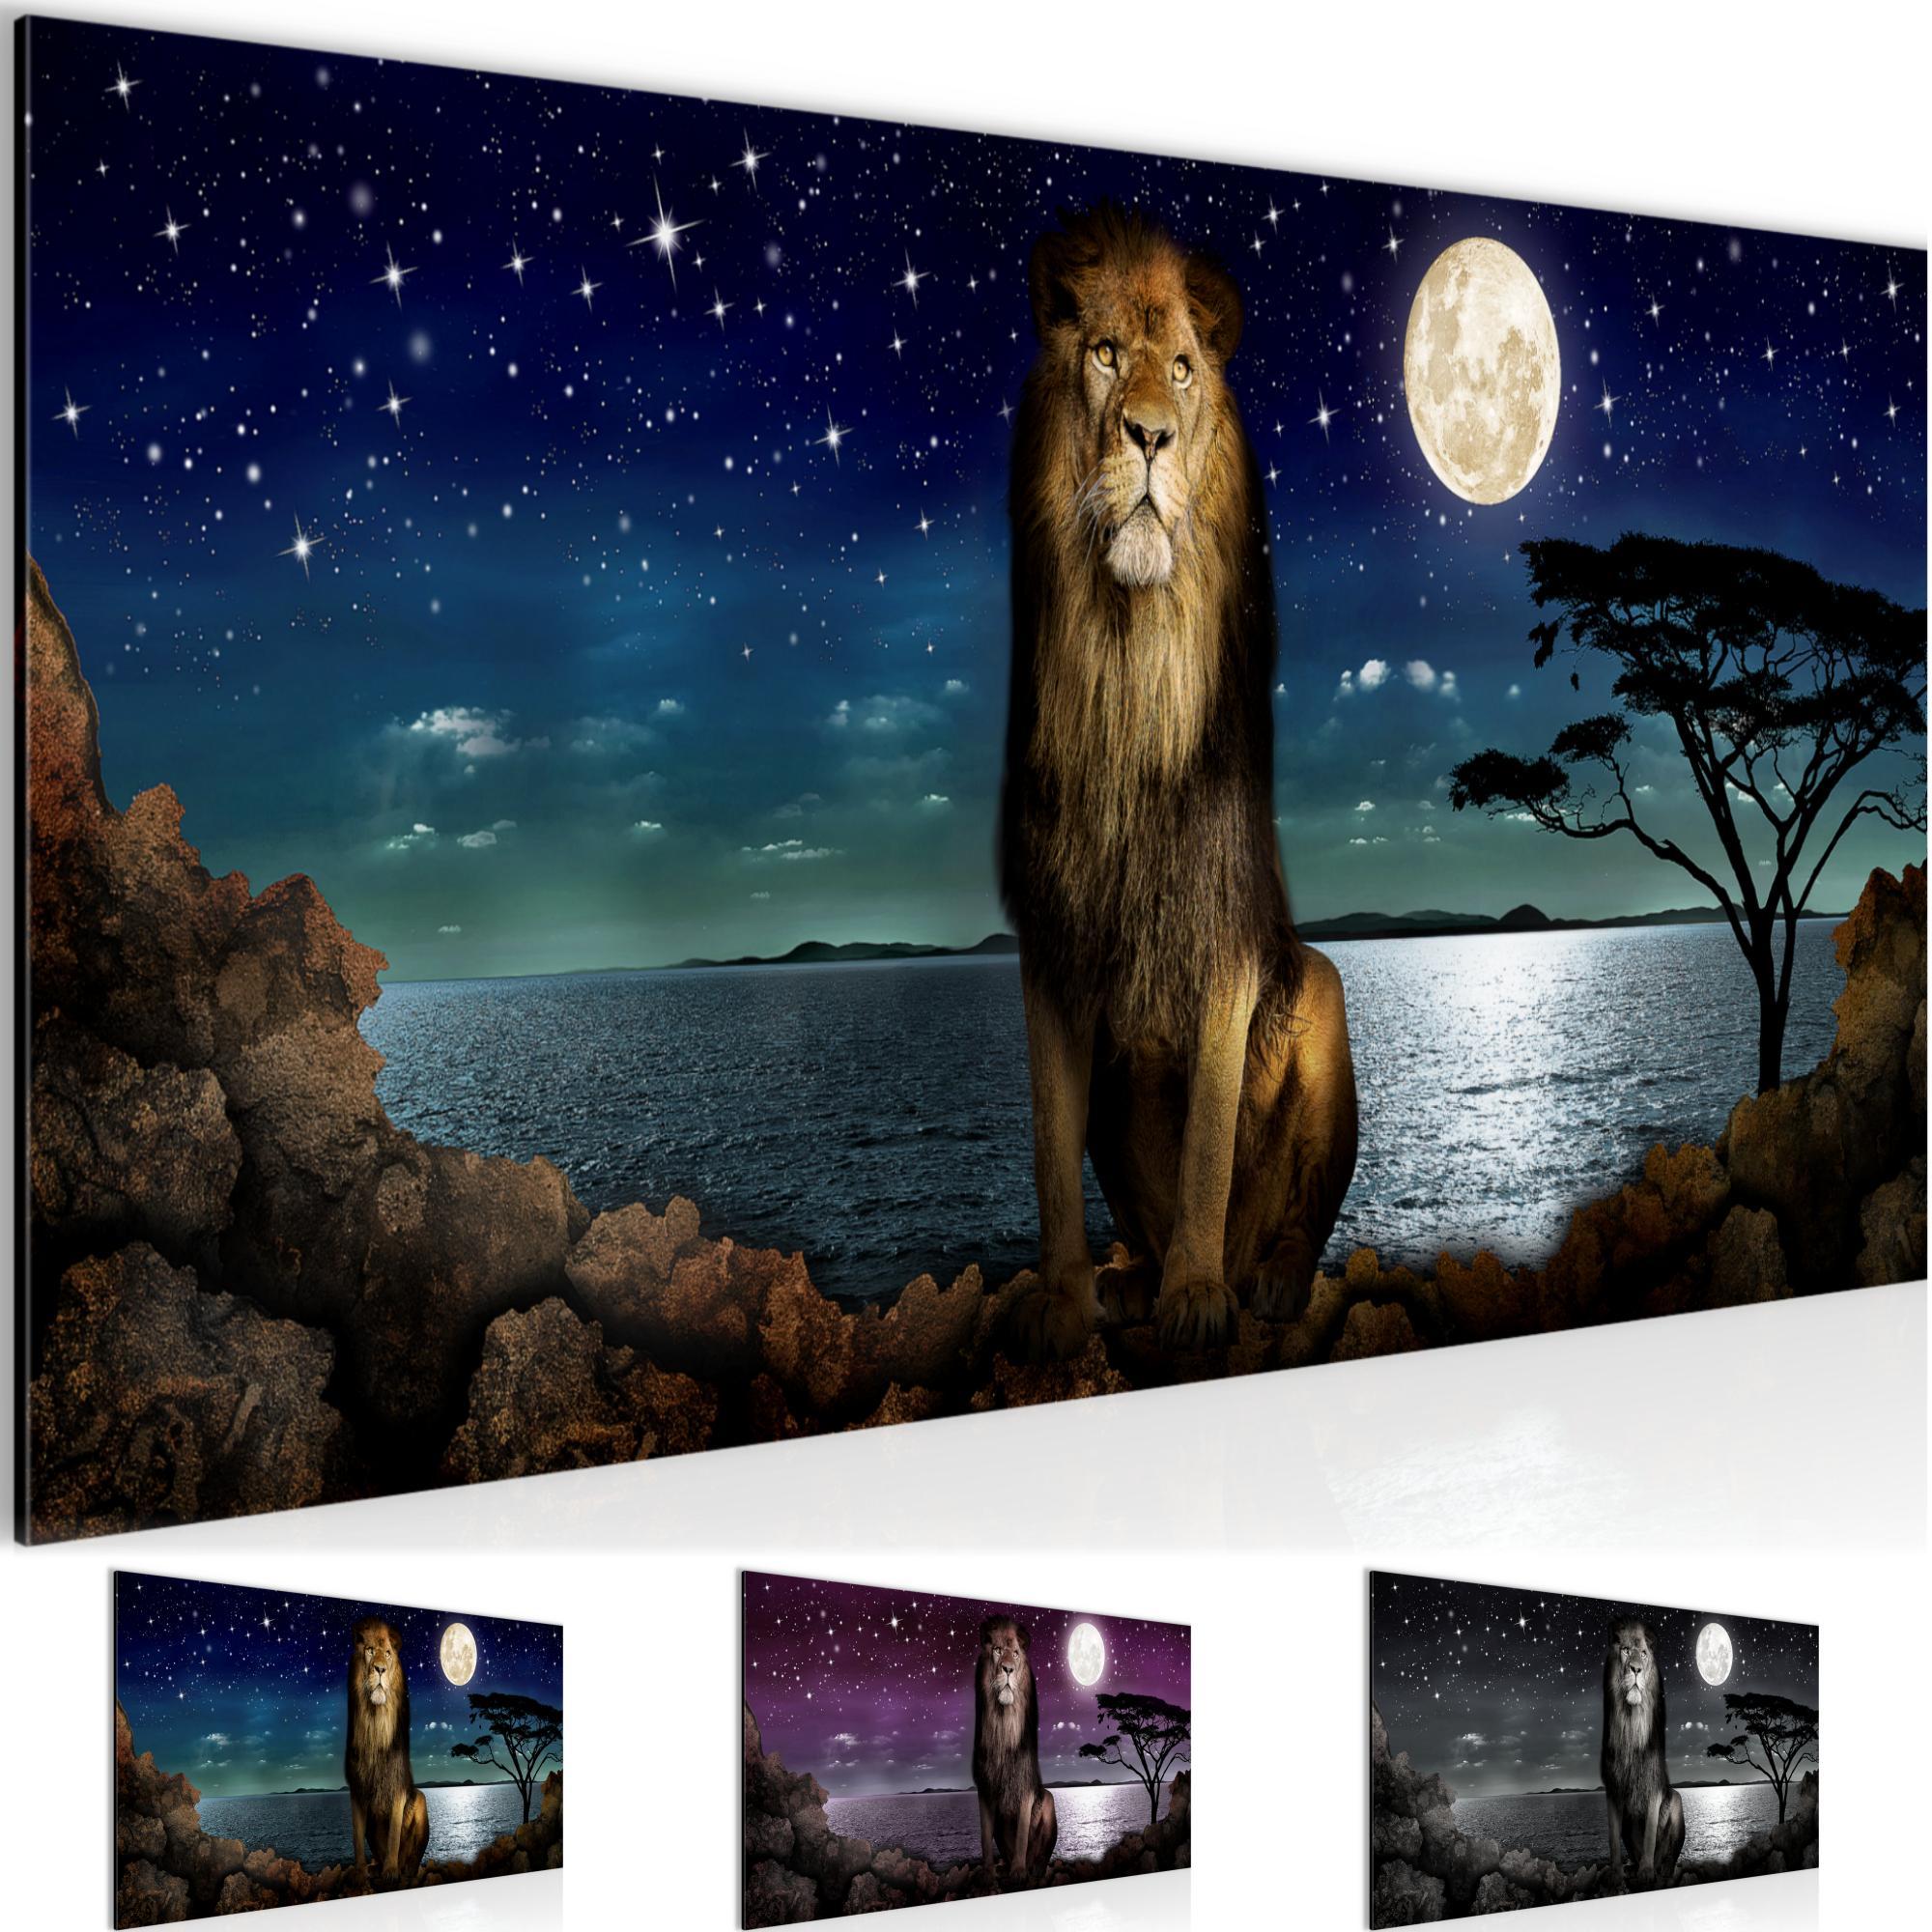 Afrika l we bild kunstdruck auf vlies leinwand xxl dekoration 022912p - Dekoration afrika ...